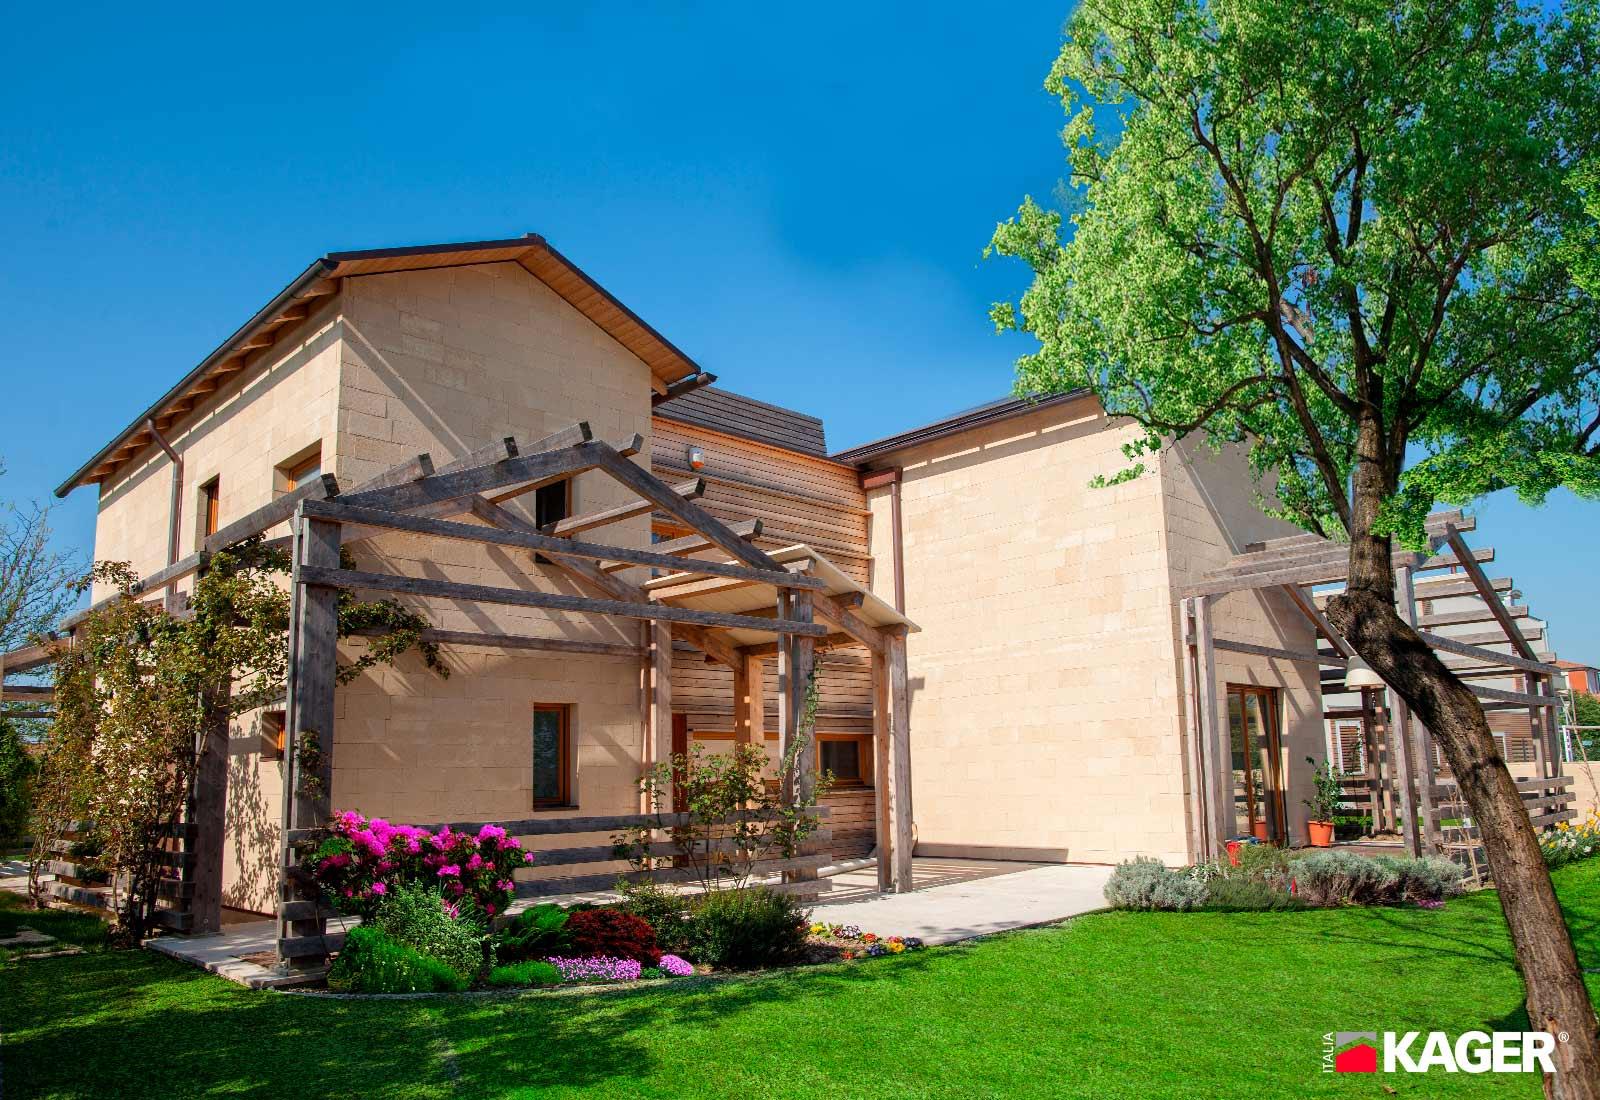 Casa-in-legno-Forli-Kager-Italia-14